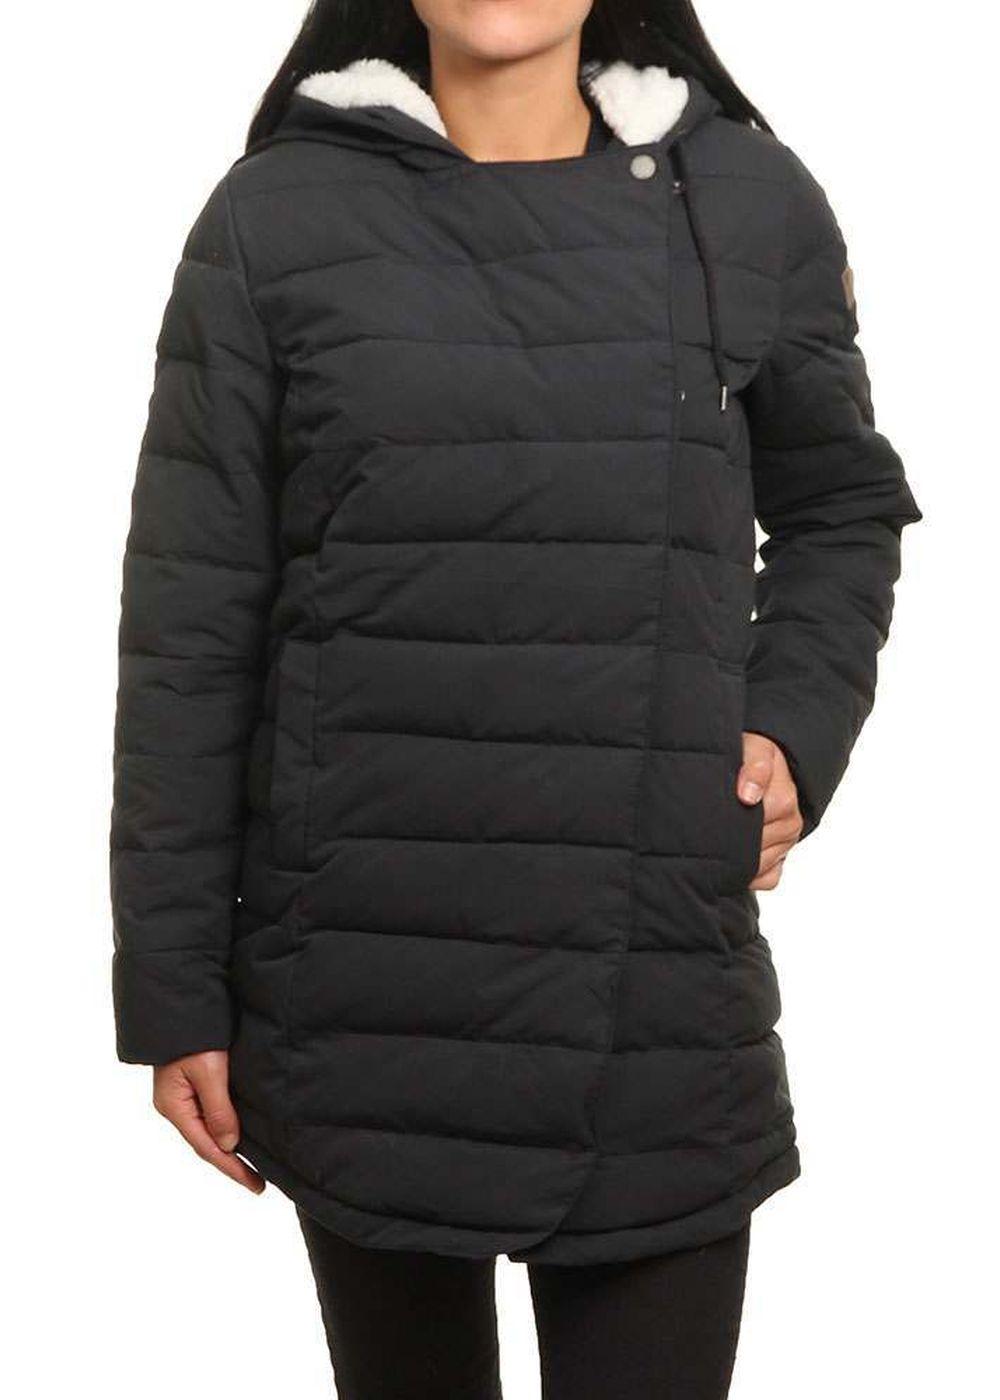 roxy-glassy-coast-jacket-anthracite